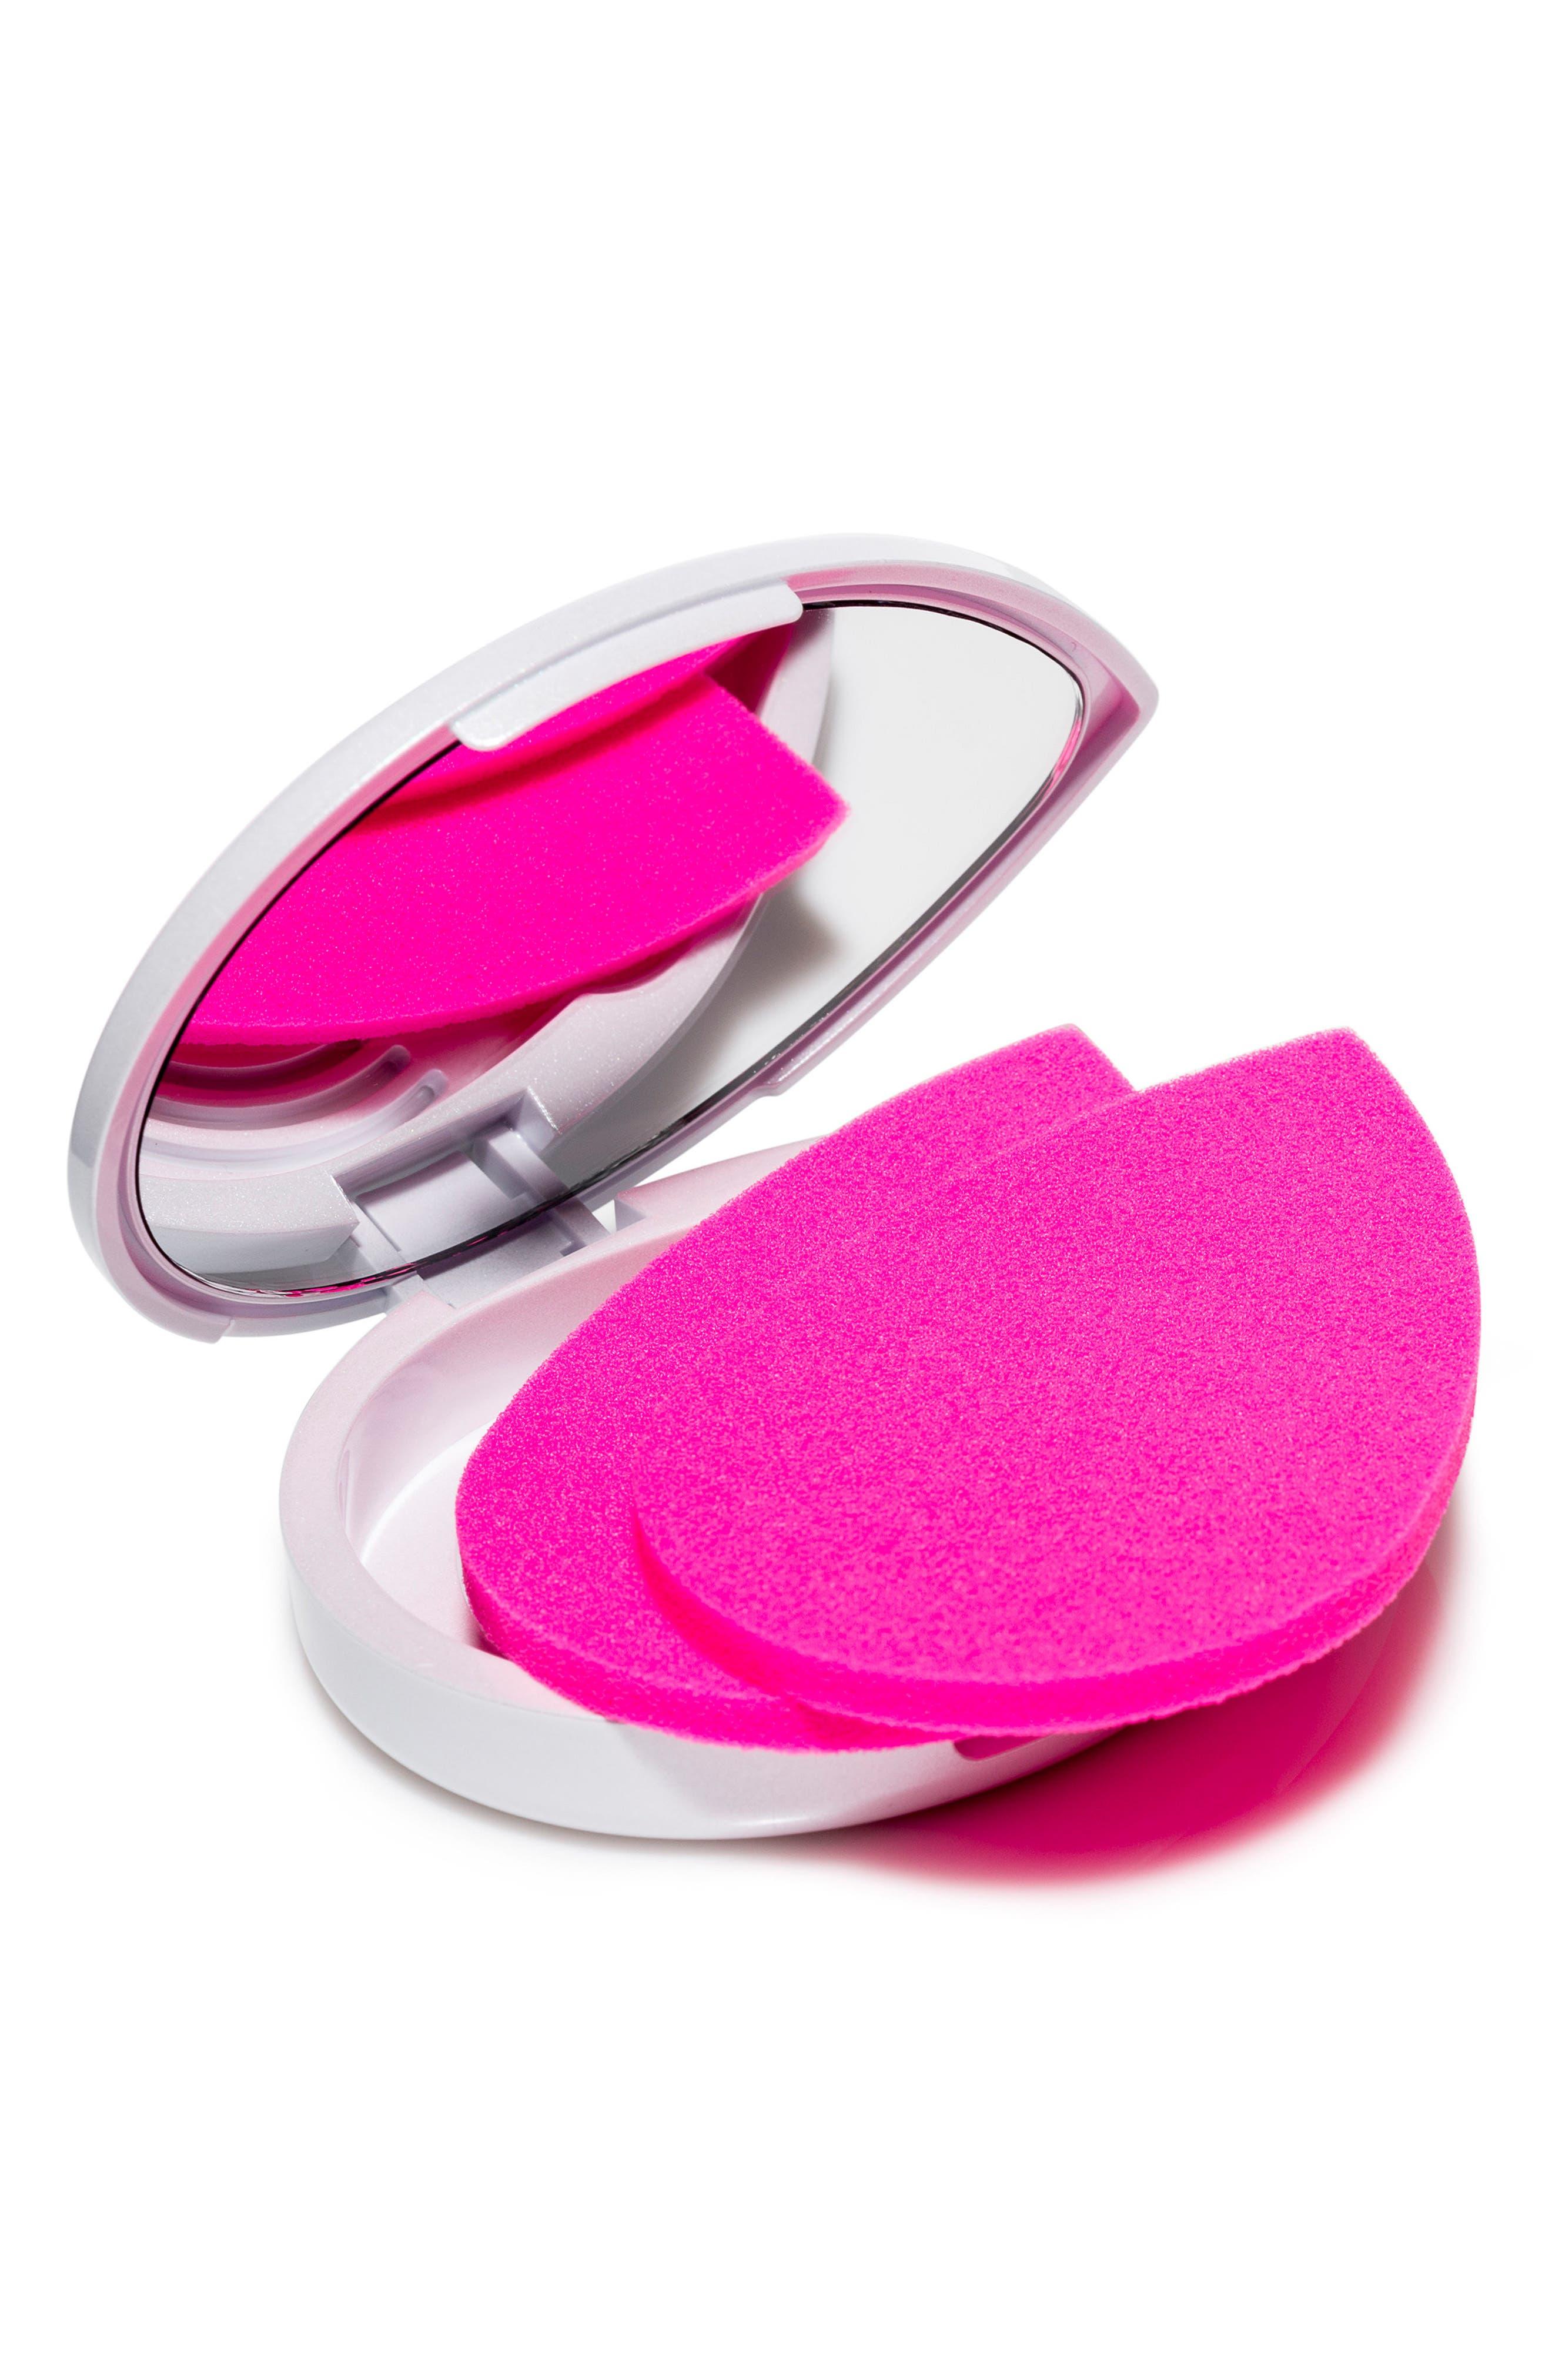 Main Image - beautyblender® blotterazzi Blotting Sponges & Compact